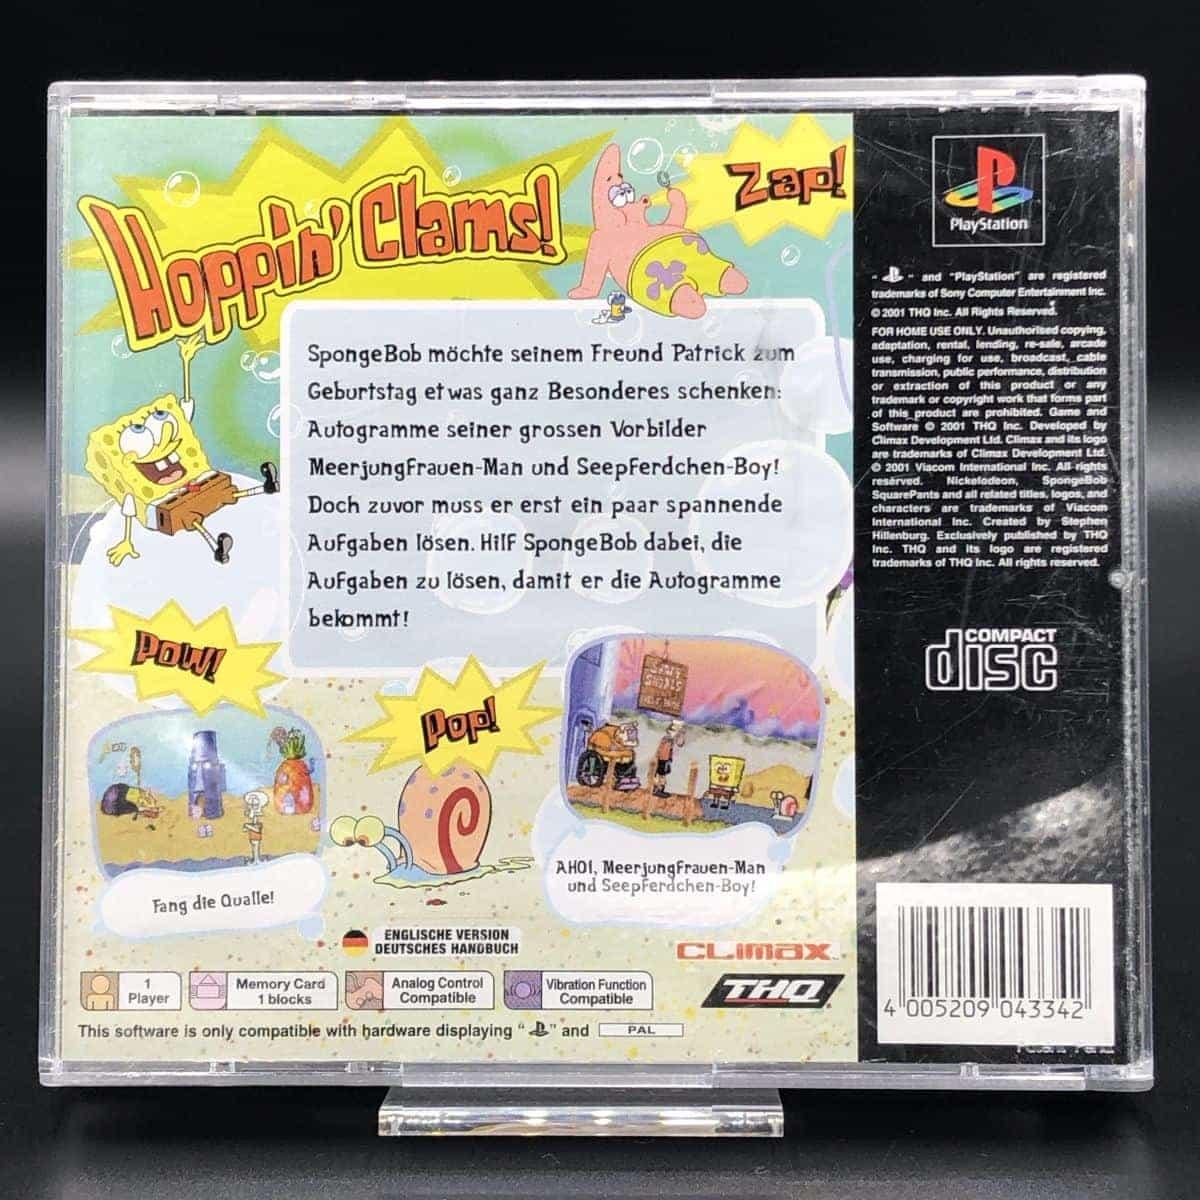 PS1 SpongeBob SquarePants - SuperSponge (Komplett) (Sehr gut) Sony PlayStation 1